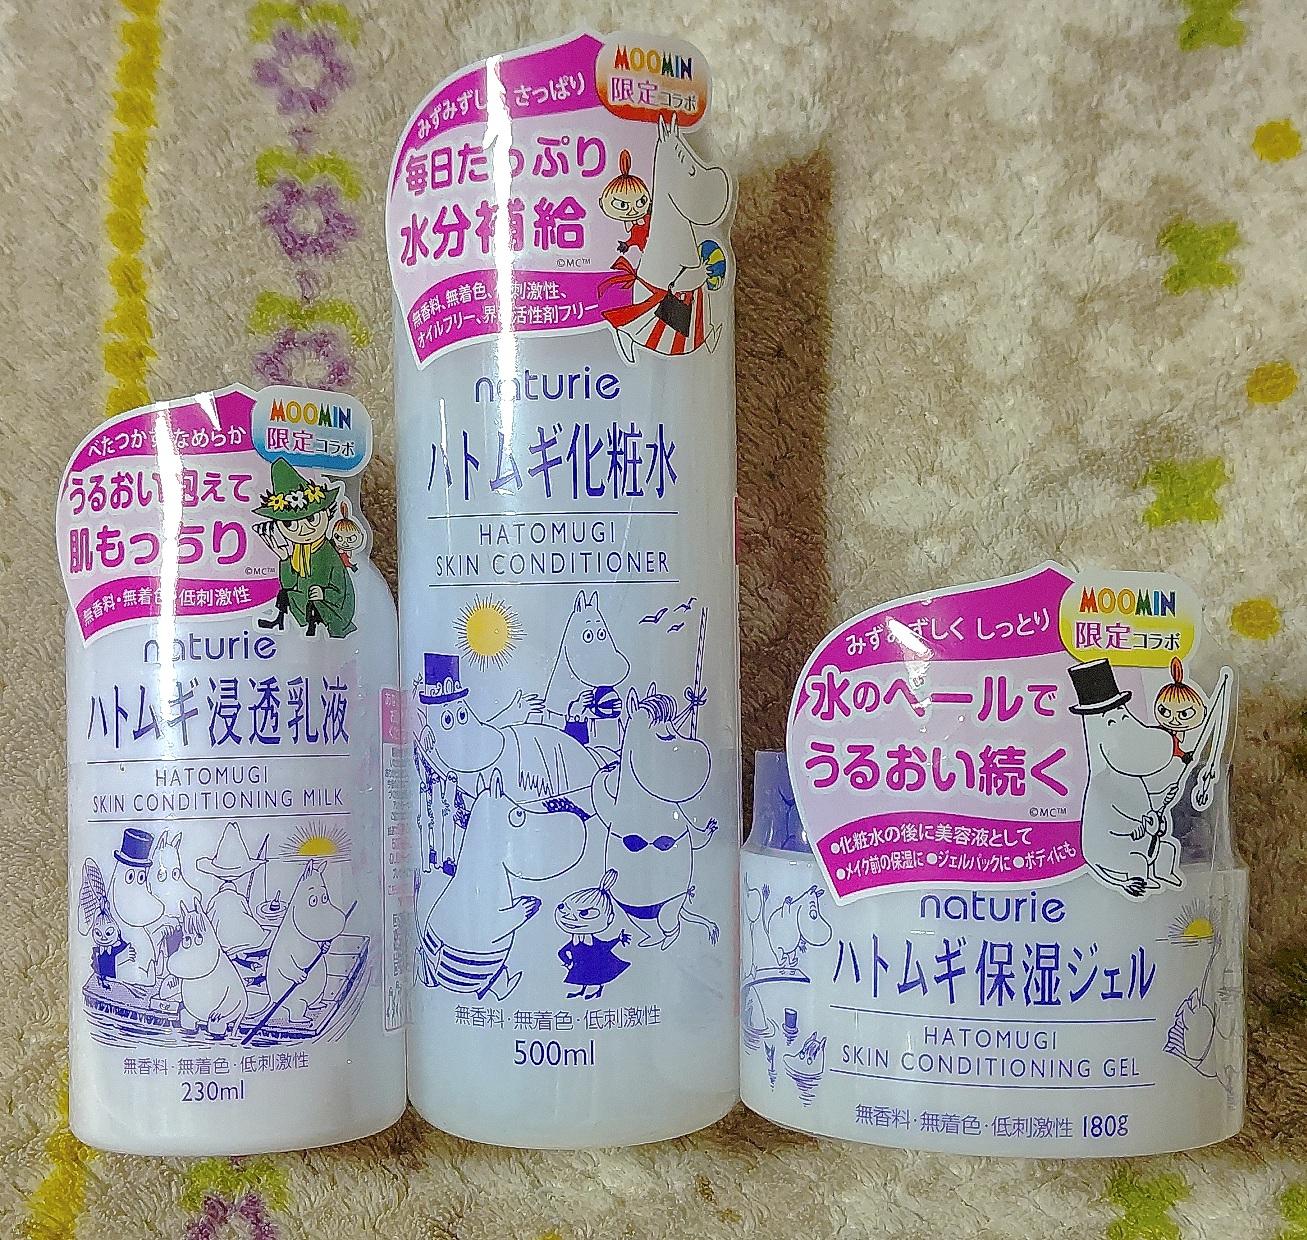 naturie(ナチュリエ) ハトムギ化粧水 スキンコンディショナーの良い点・メリットに関する和田晶子(ワダショウコ)さんの口コミ画像1